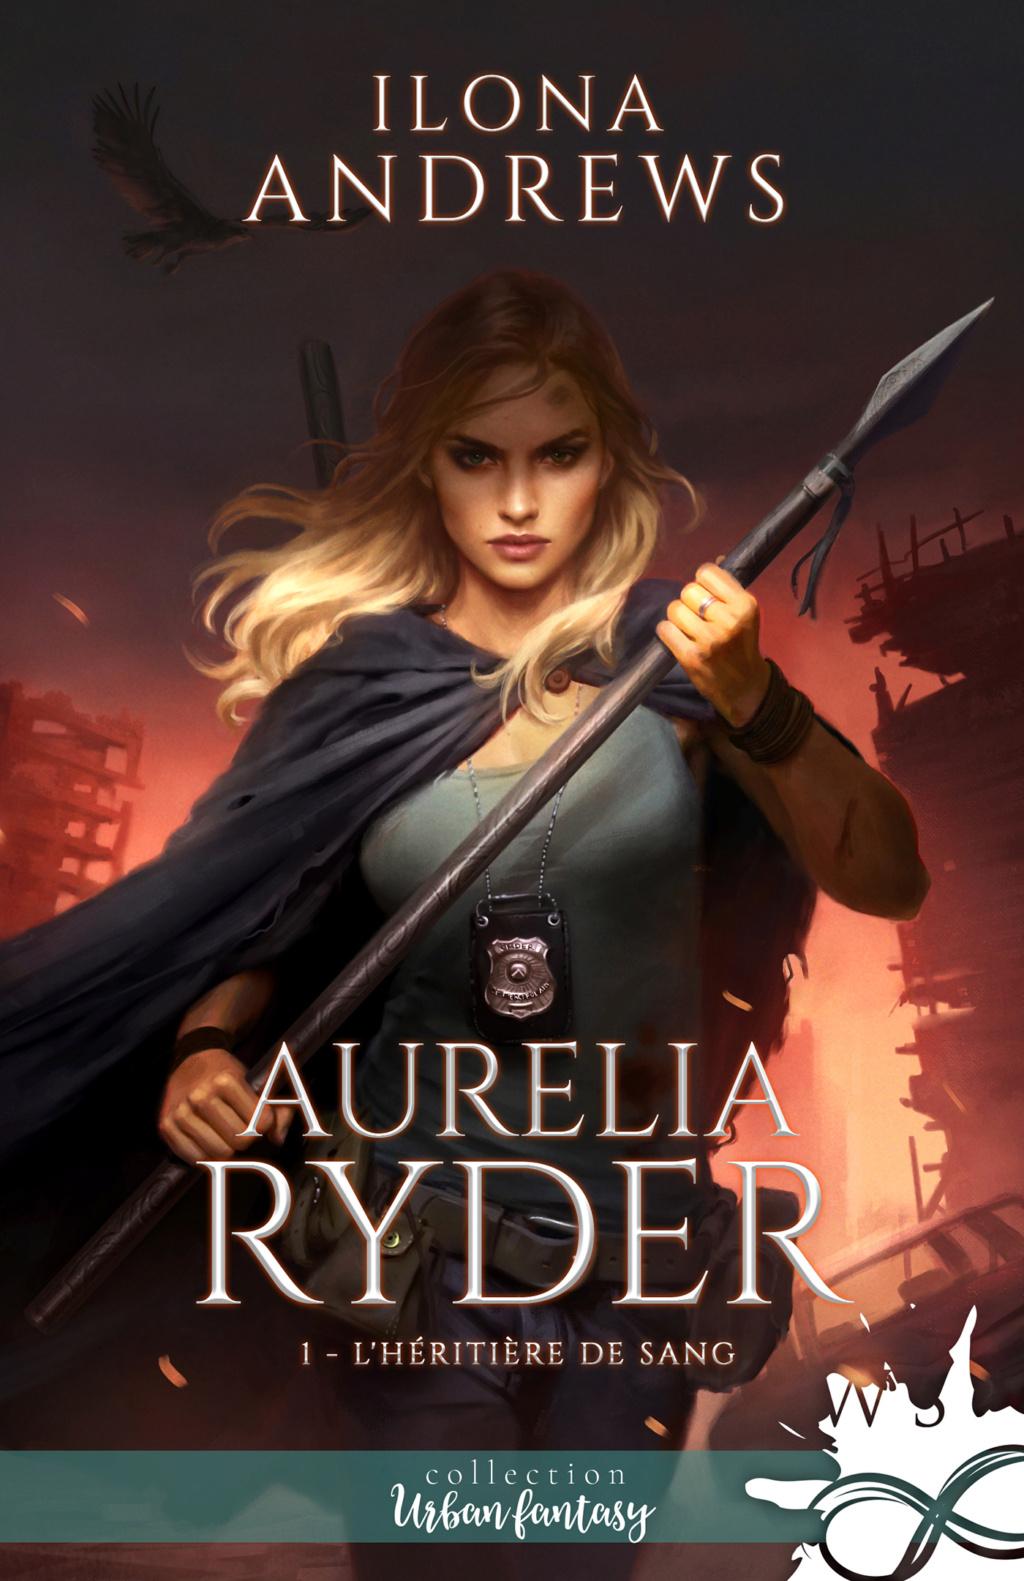 Aurelia Ryder - Tome 1 : L'héritière de sang de Ilona Andrews {Spin Off de Kate Daniels}    591daa10